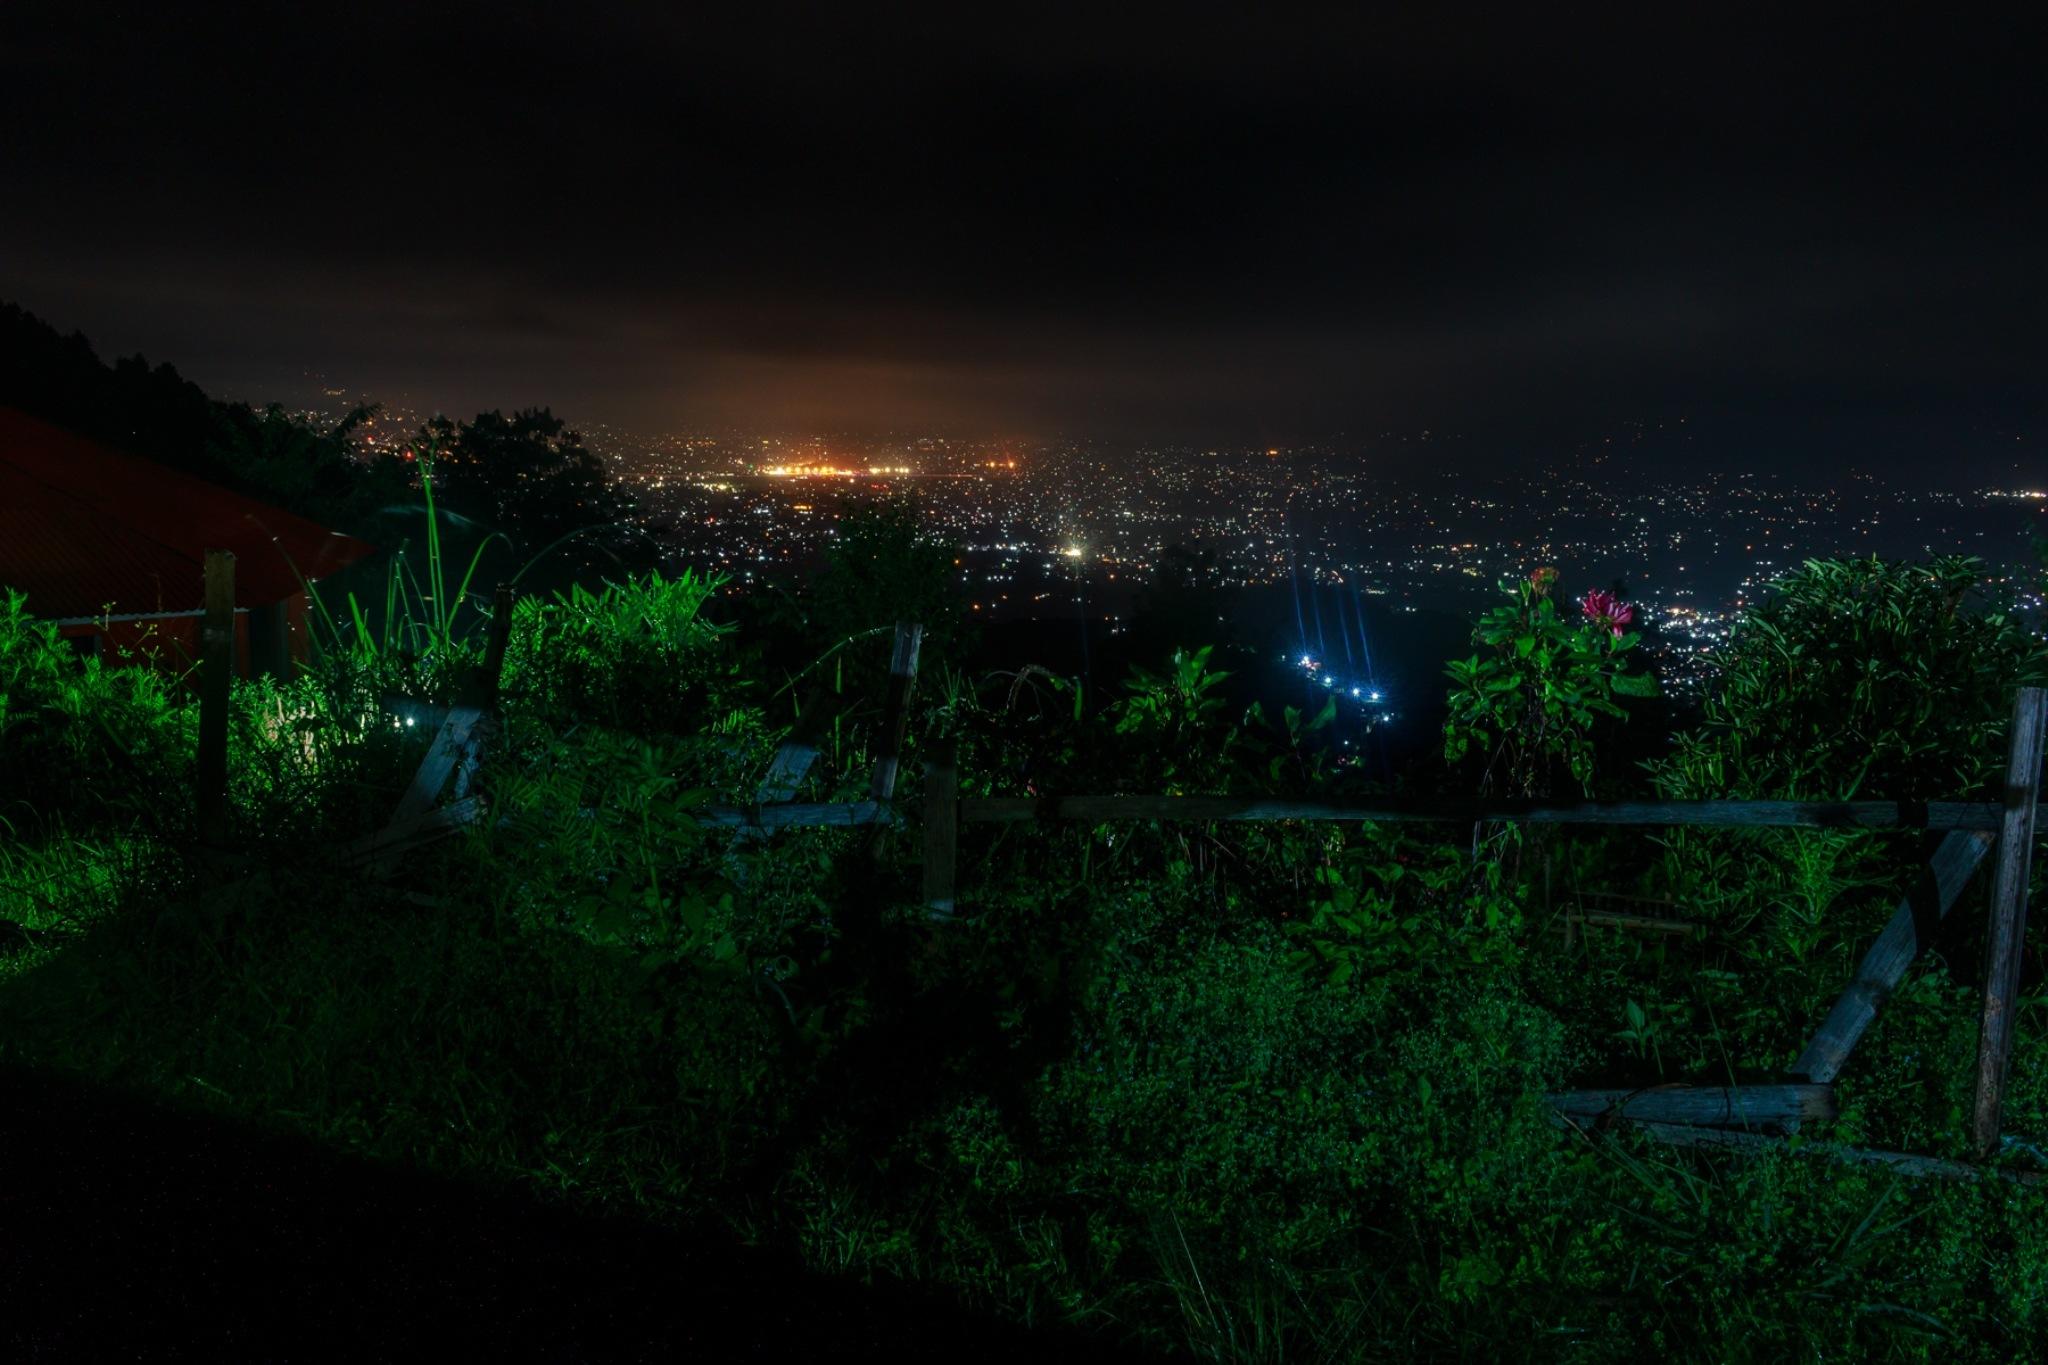 Kathmandu at night by sushil bhattarai